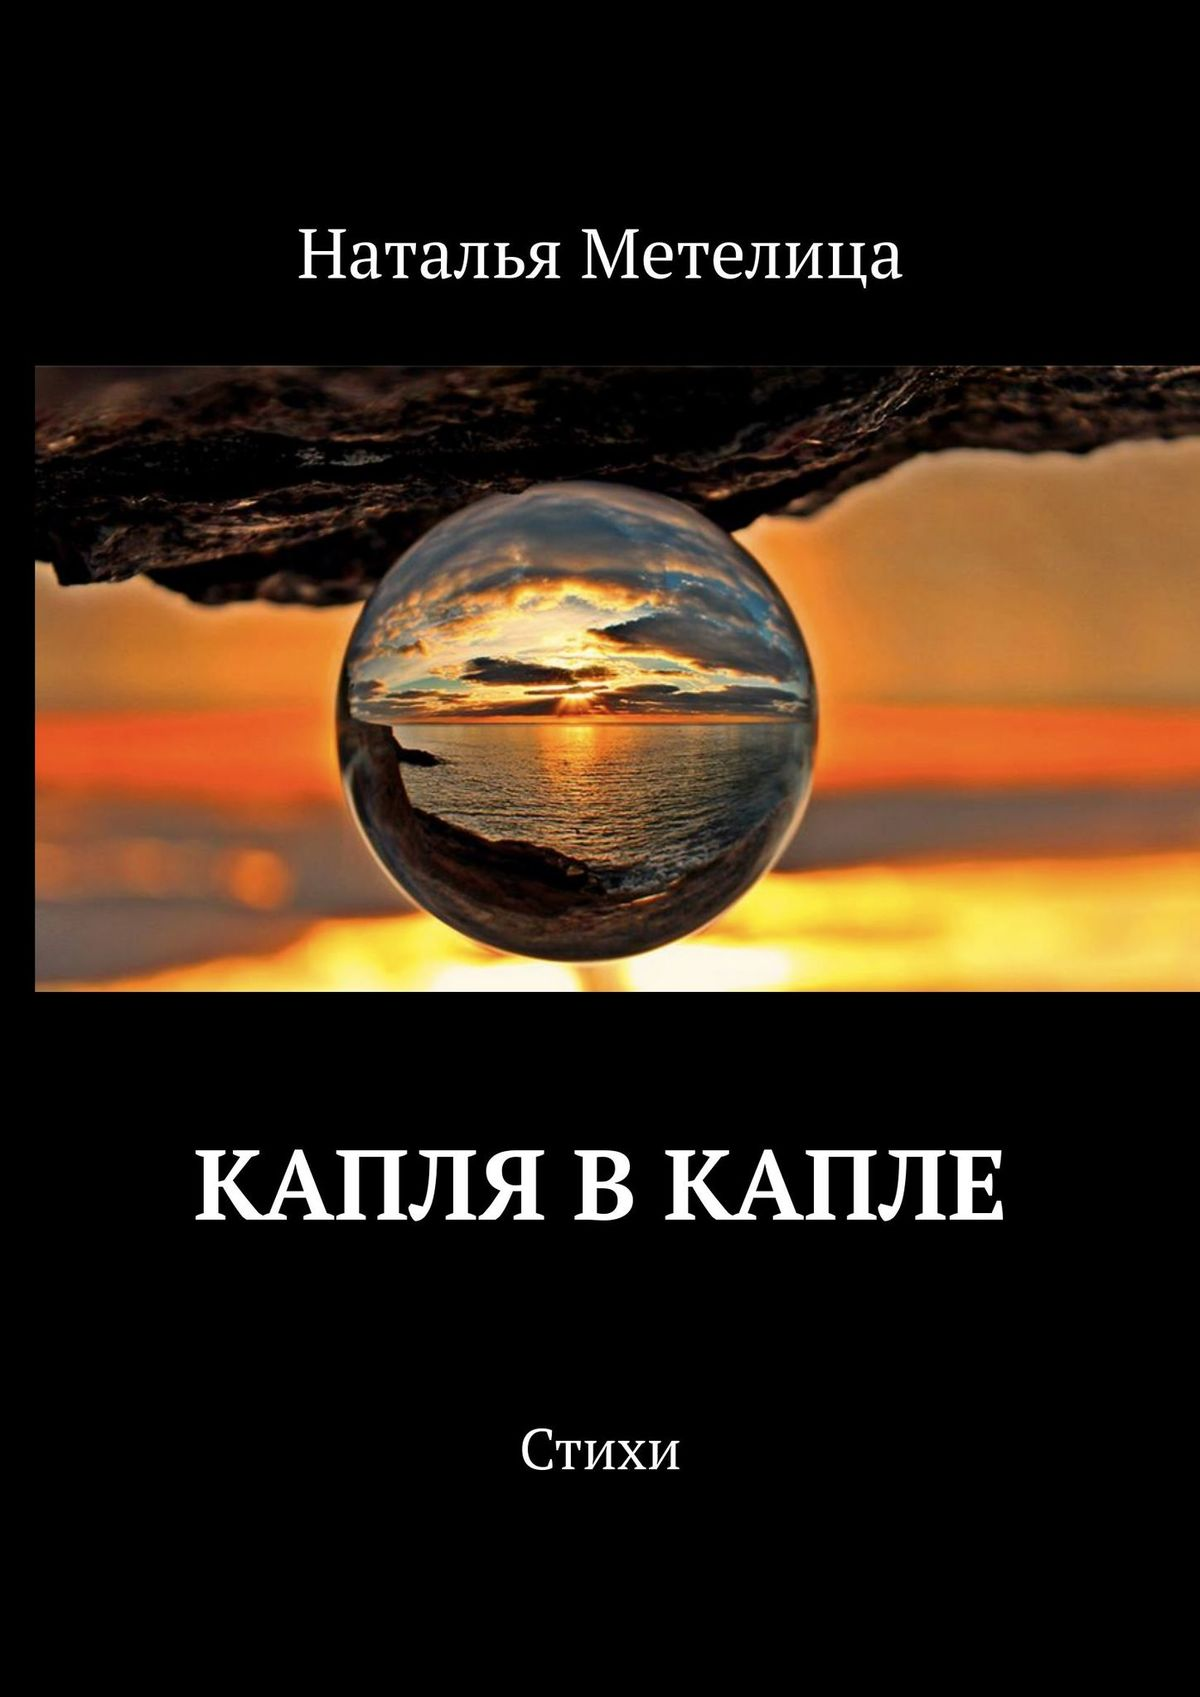 Наталья Метелица - КАПЛЯ ВКАПЛЕ. Стихи